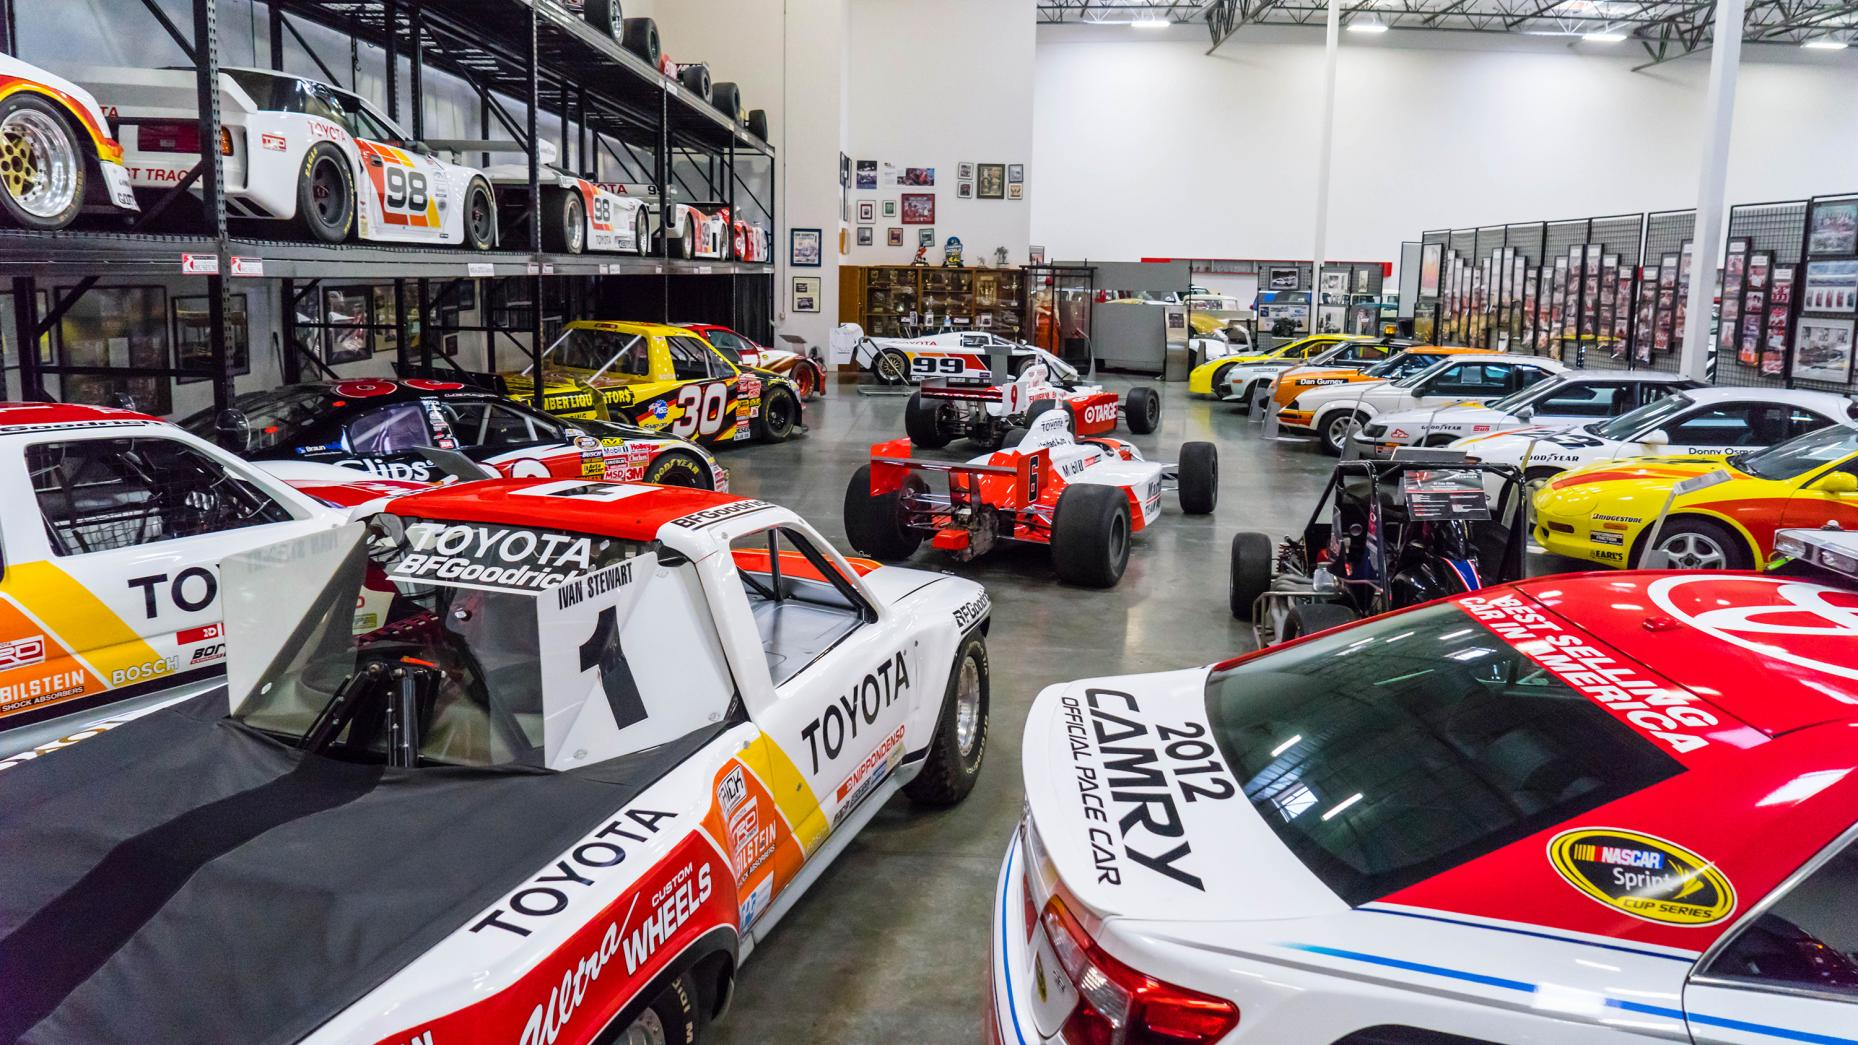 verzameling Toyota's